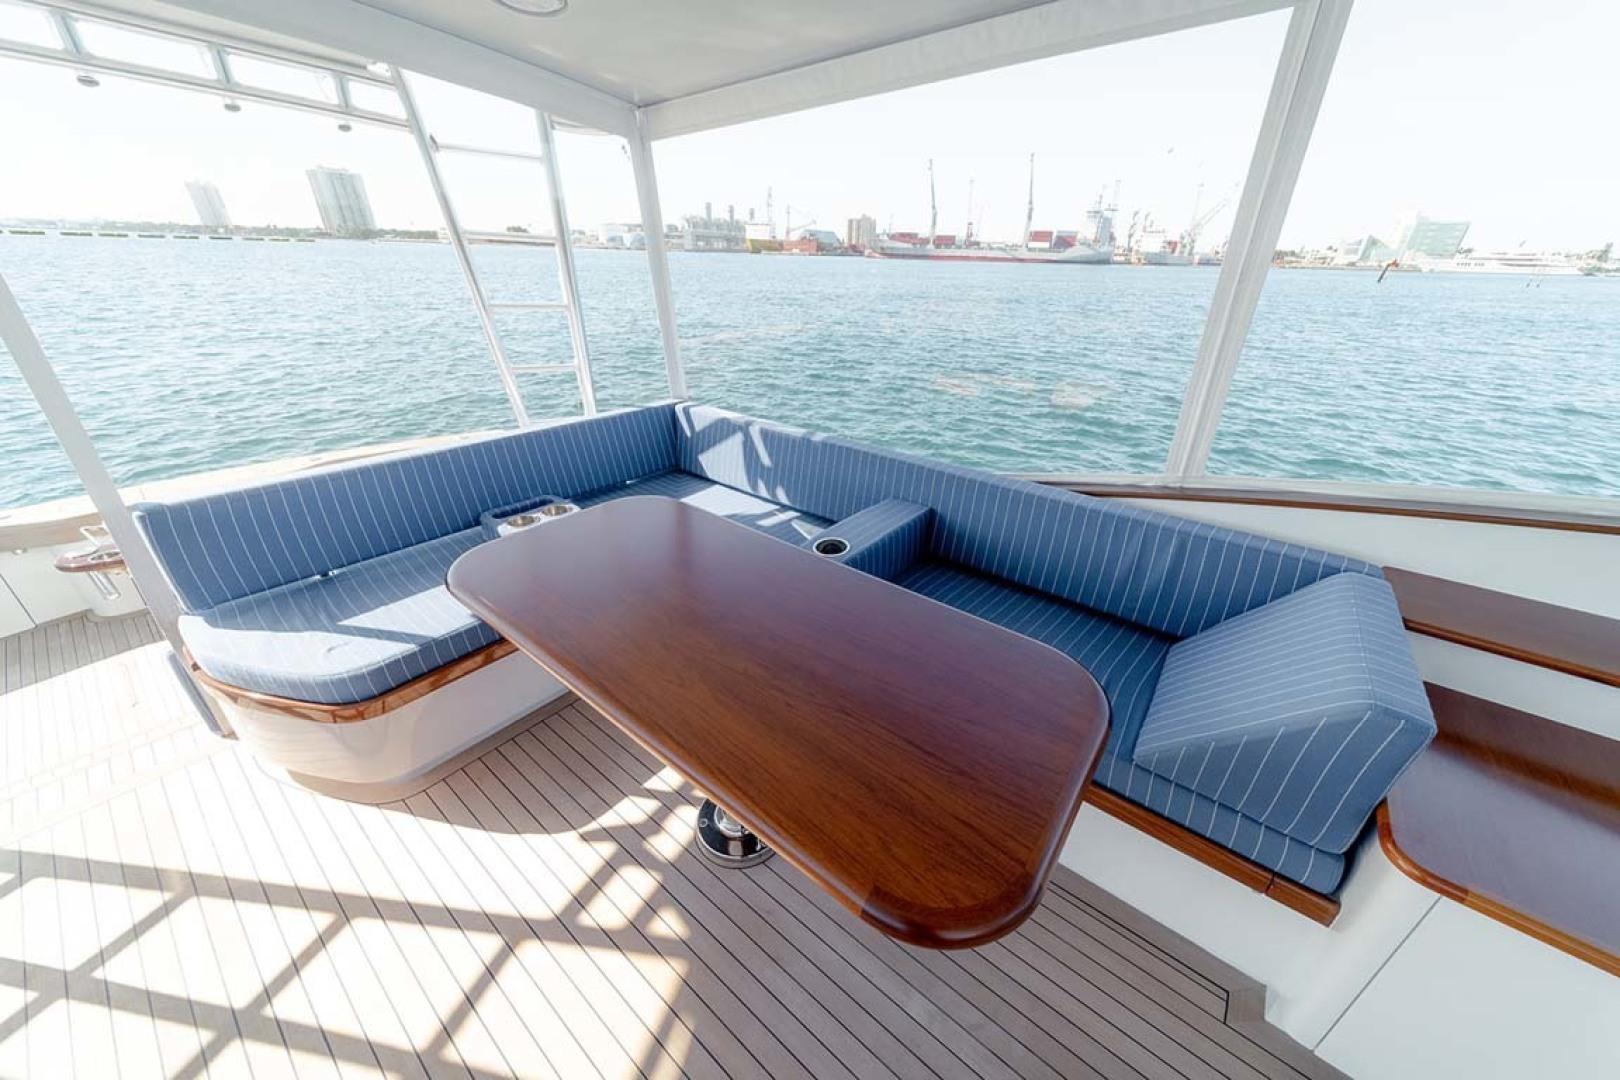 Jim Smith-Walkaround Express 2018-Eurybia North Palm Beach-Florida-United States-Teak Table and Storage underneath Seating-1573737   Thumbnail